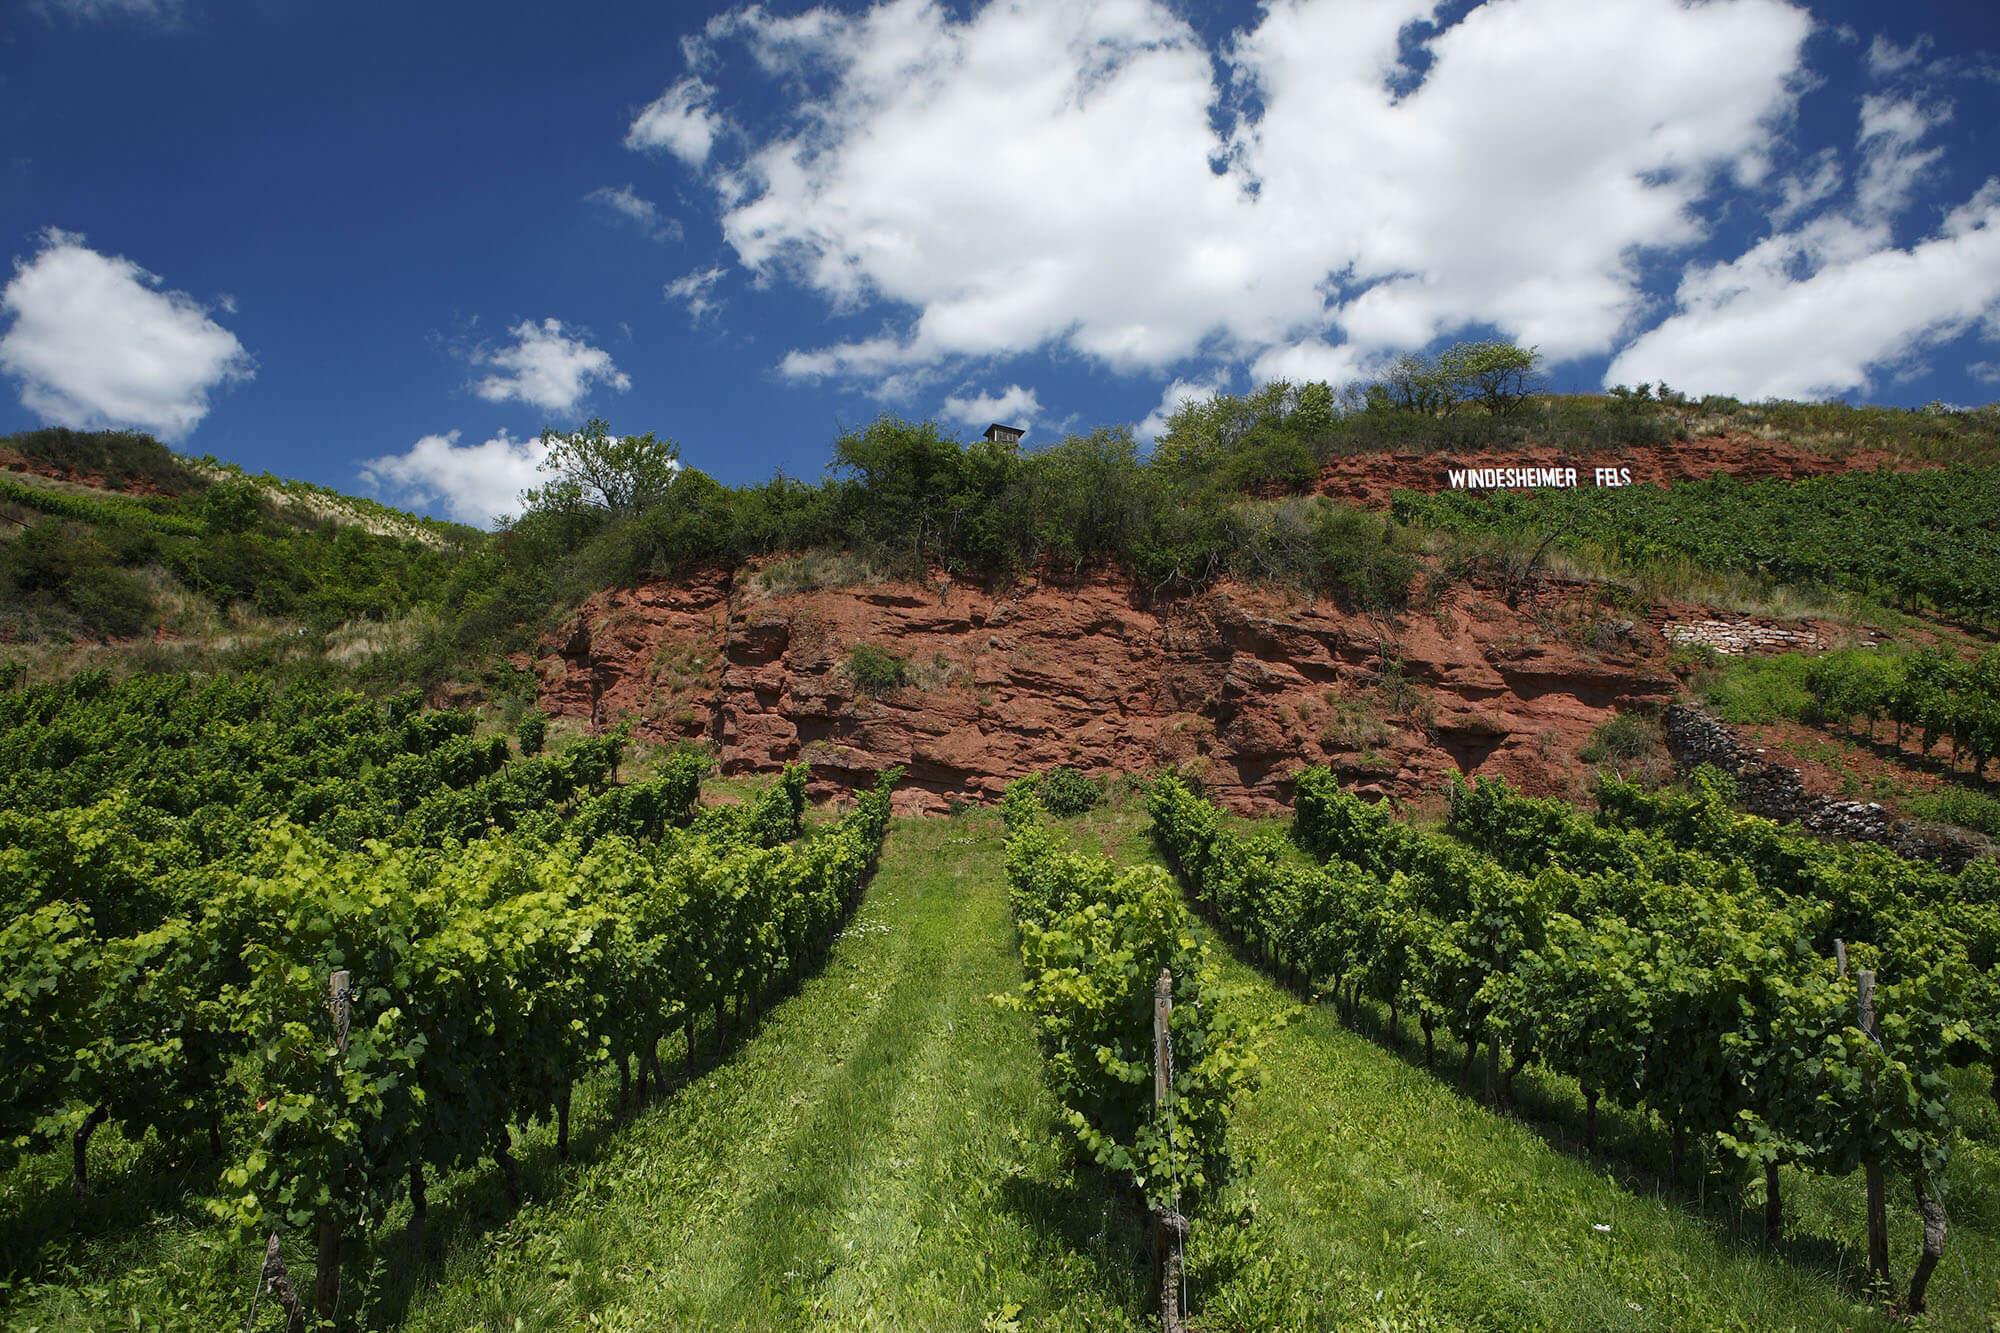 Nahe German Wines Usa